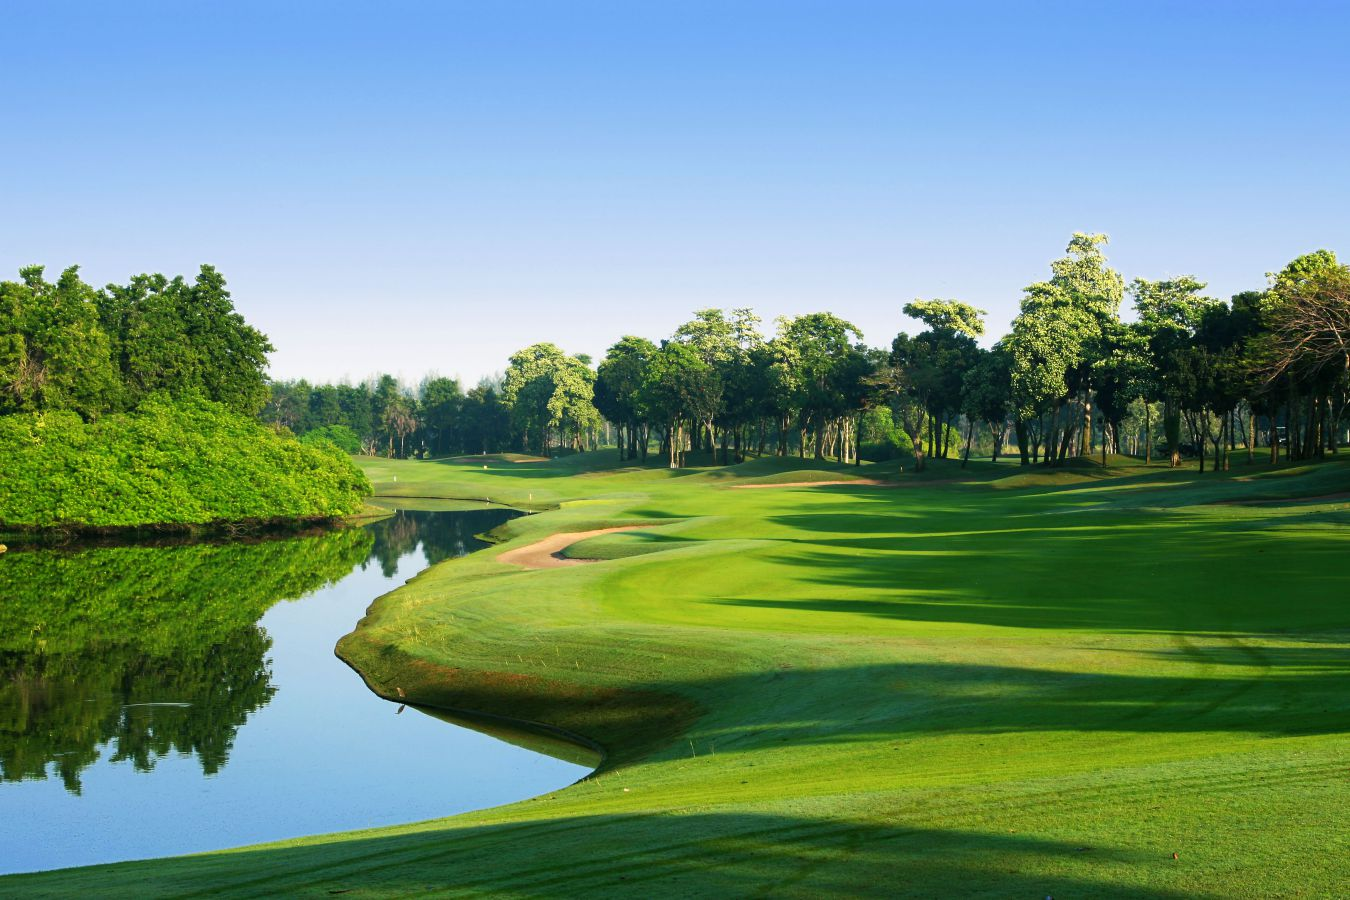 lam-luk-ka-golf-club-0